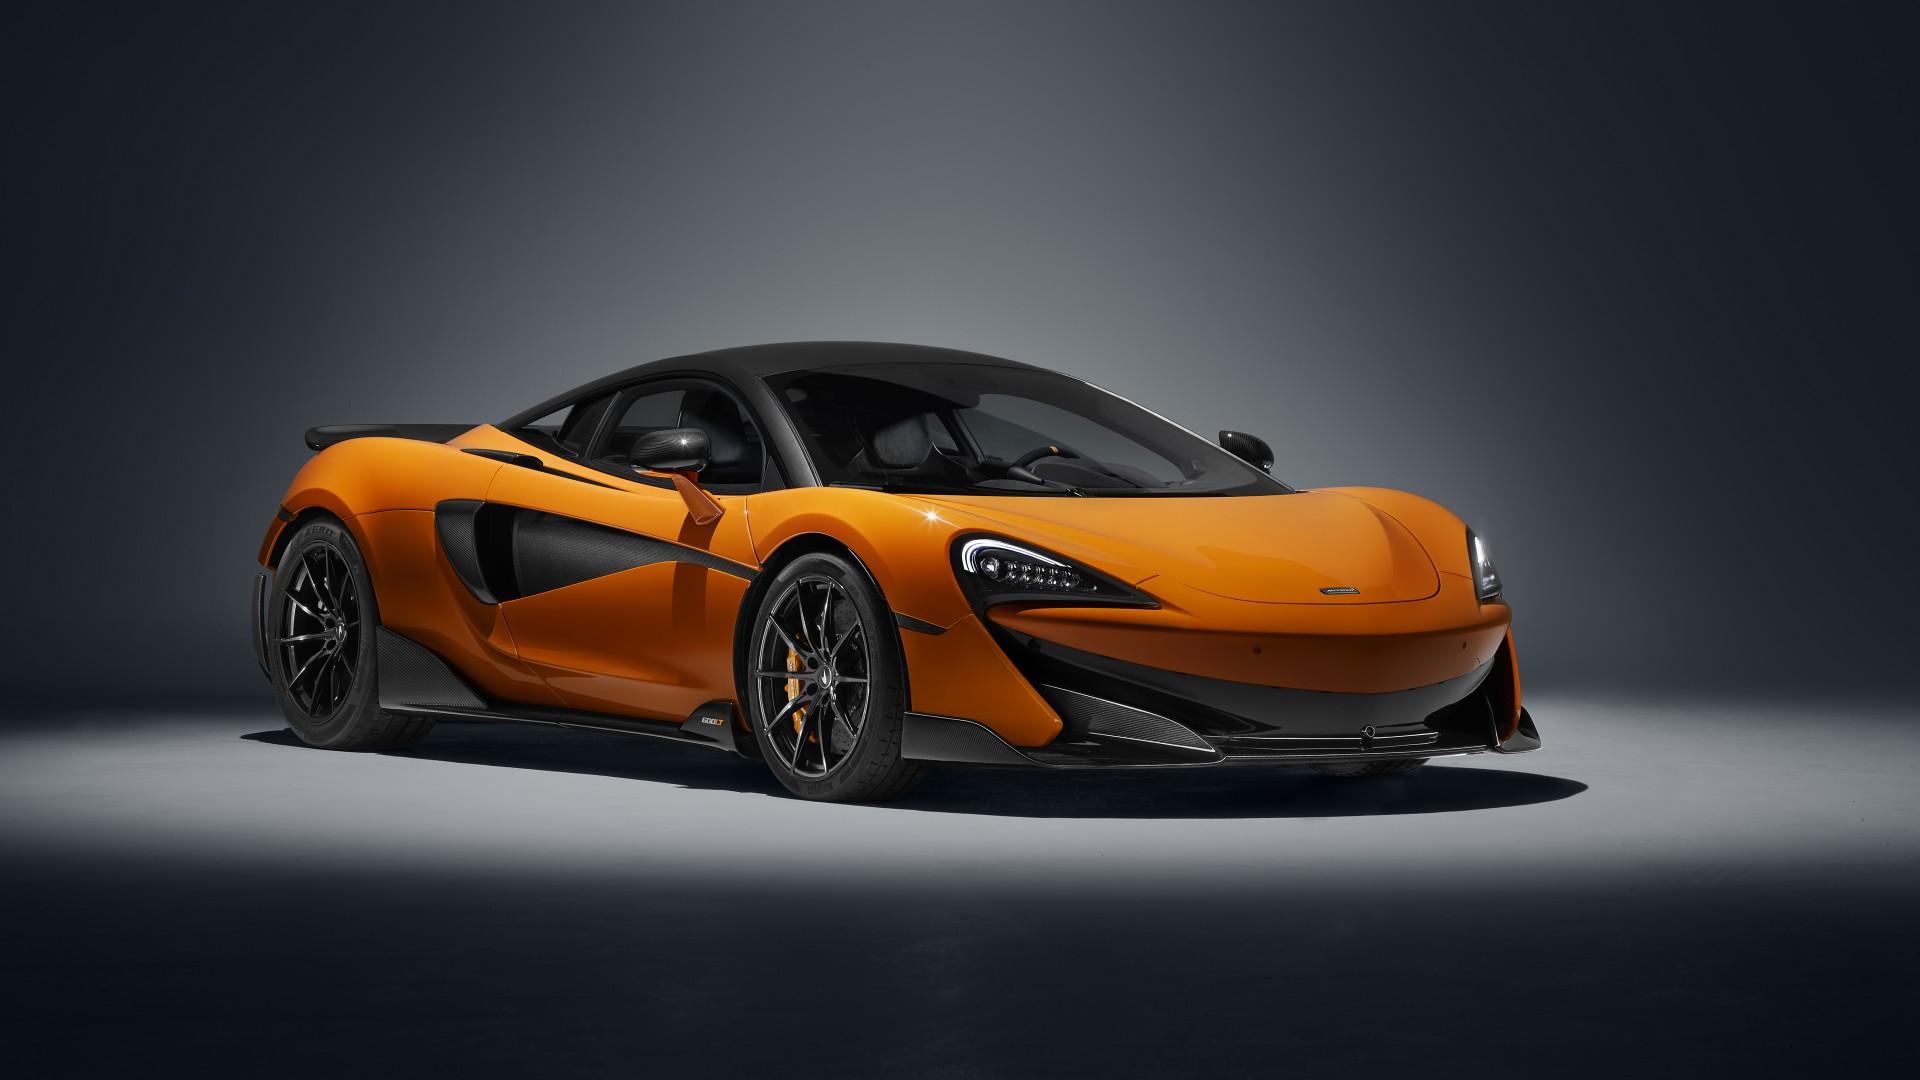 2019 McLaren 600LT 5K Wallpaper | HD Car Wallpapers | ID ...